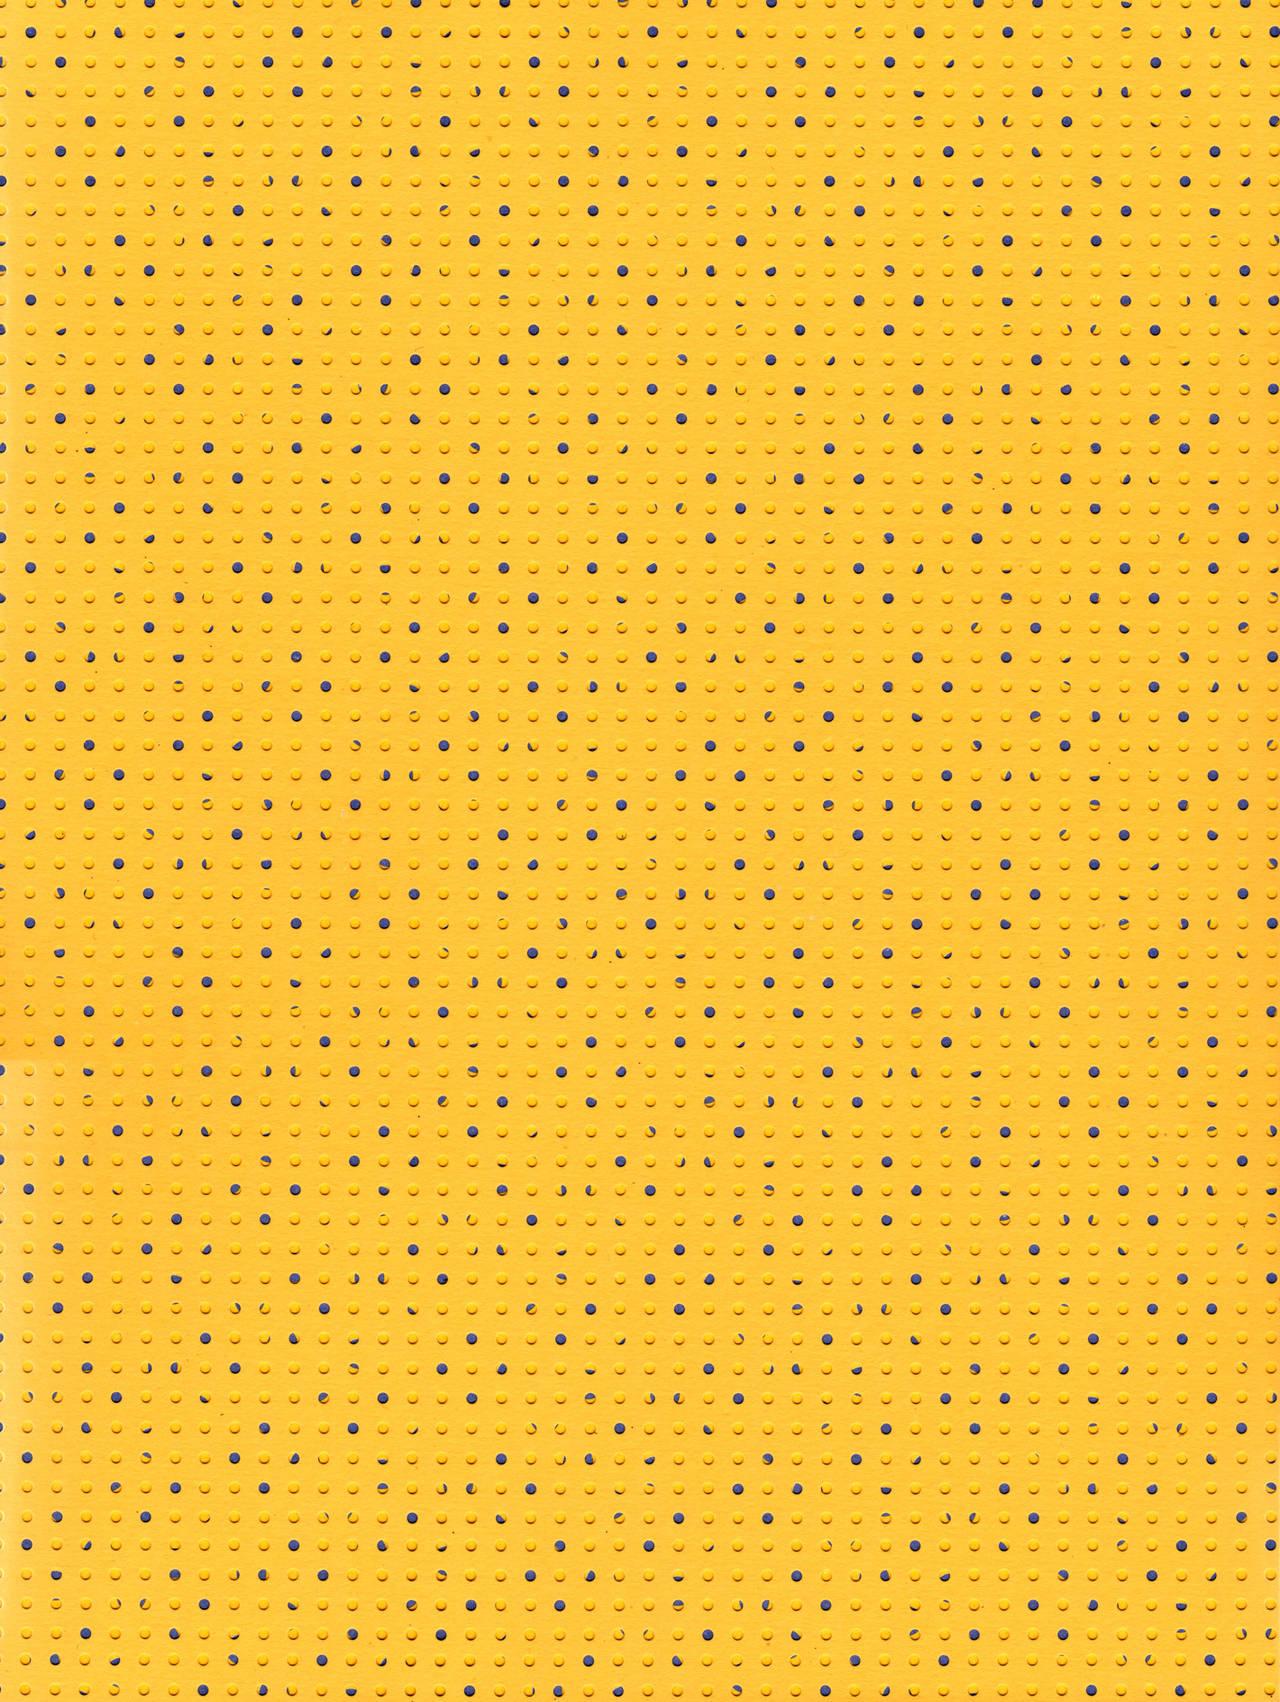 Gilbert hsiao open composition 16 for sale at 1stdibs - Papier peint st maclou ...